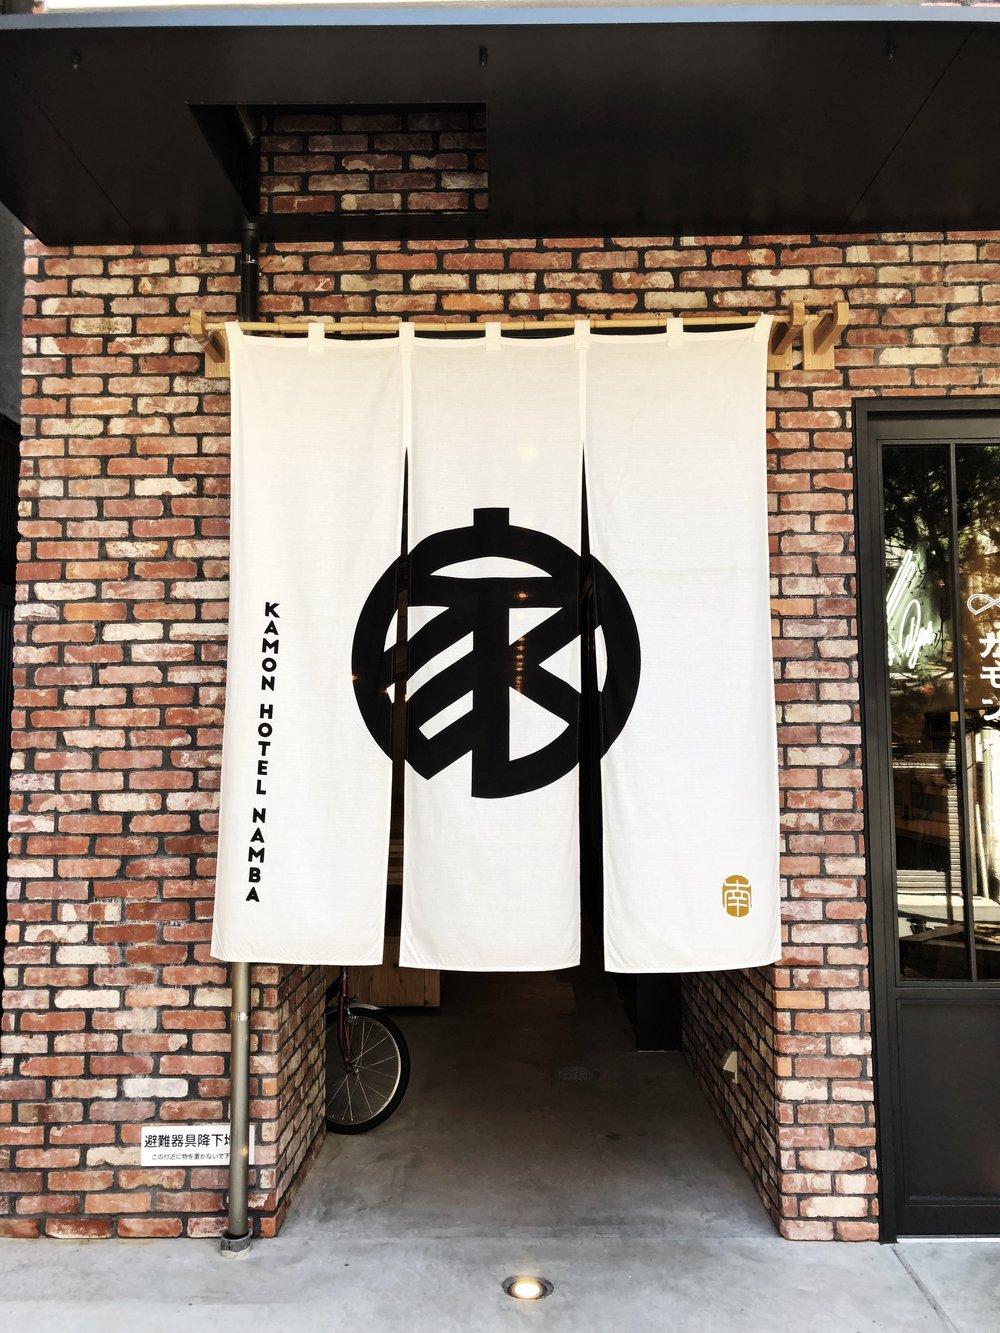 Kamon Hotel Namba, Osaka Japan